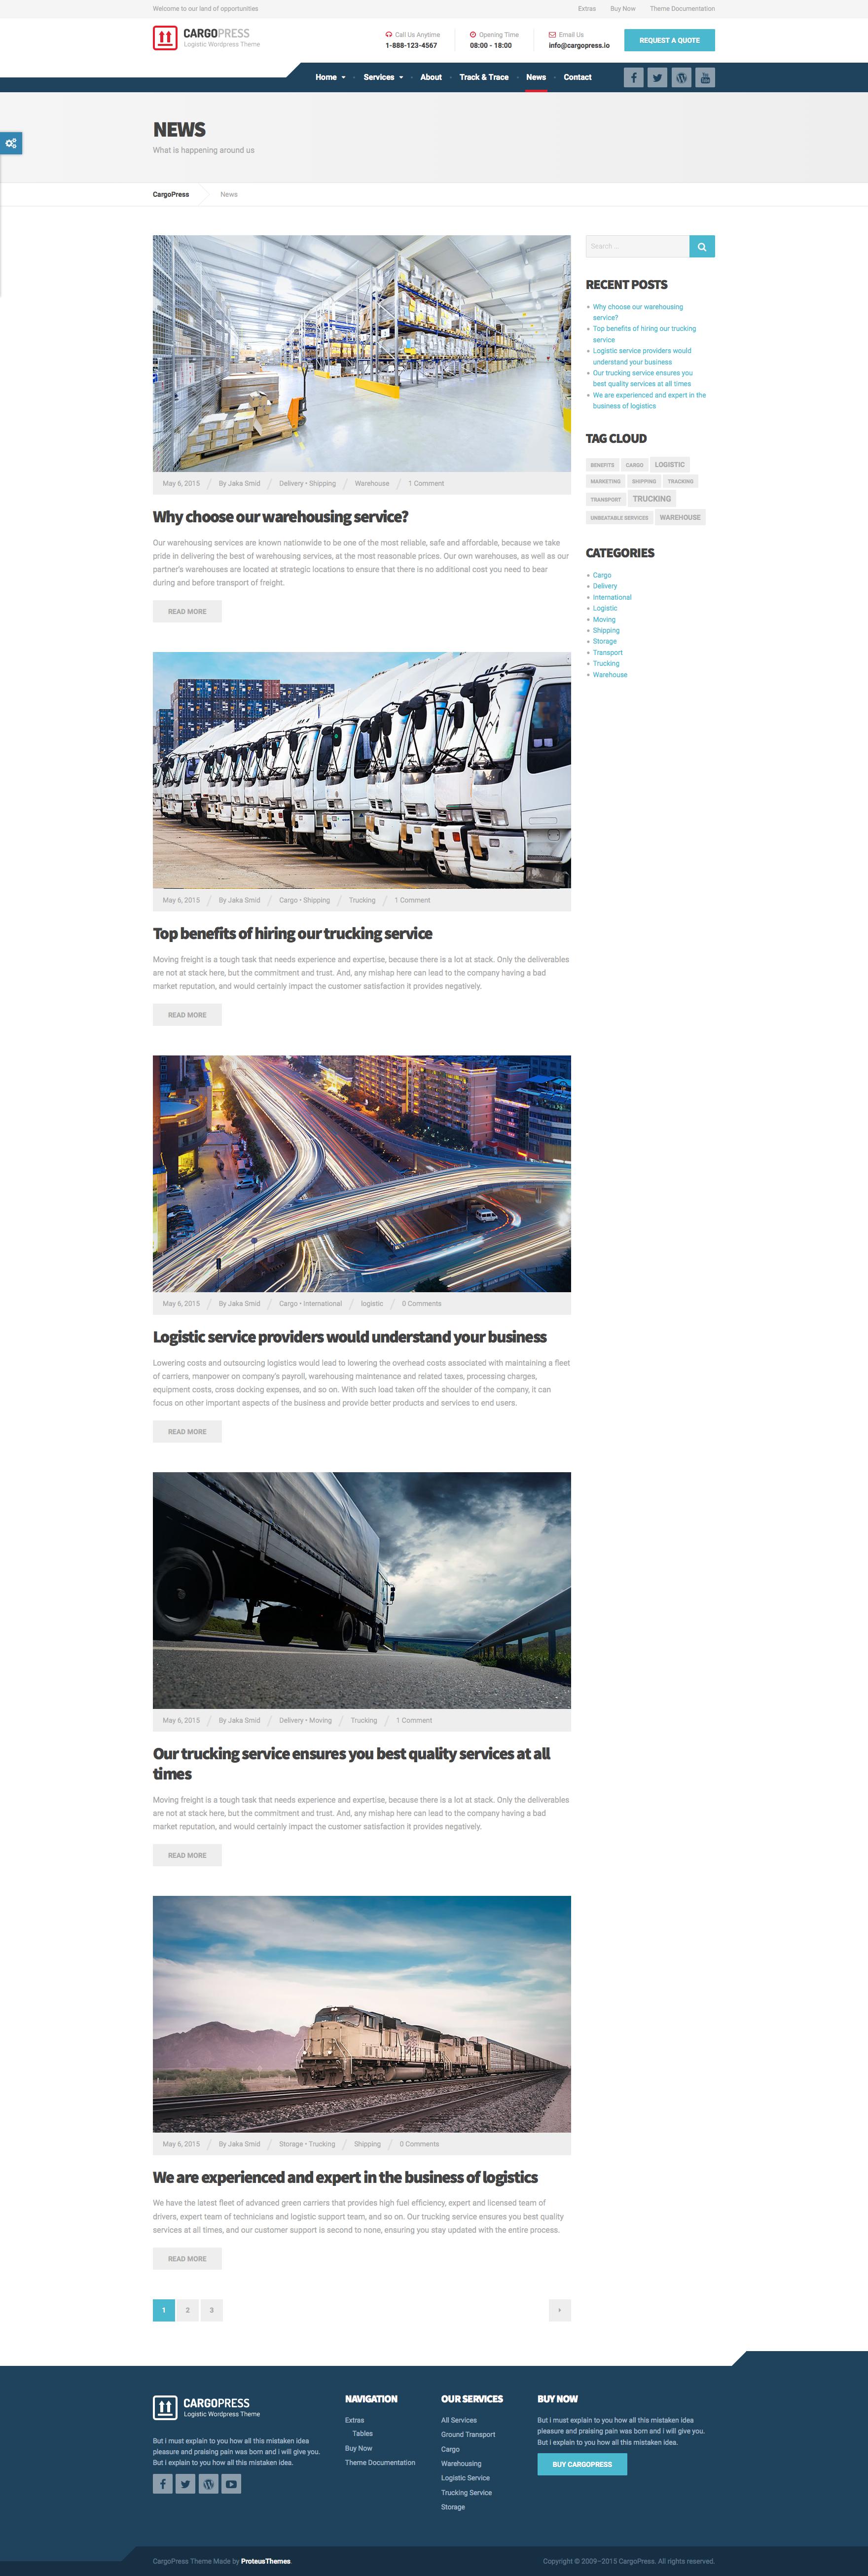 Cargopress logistic warehouse transport html